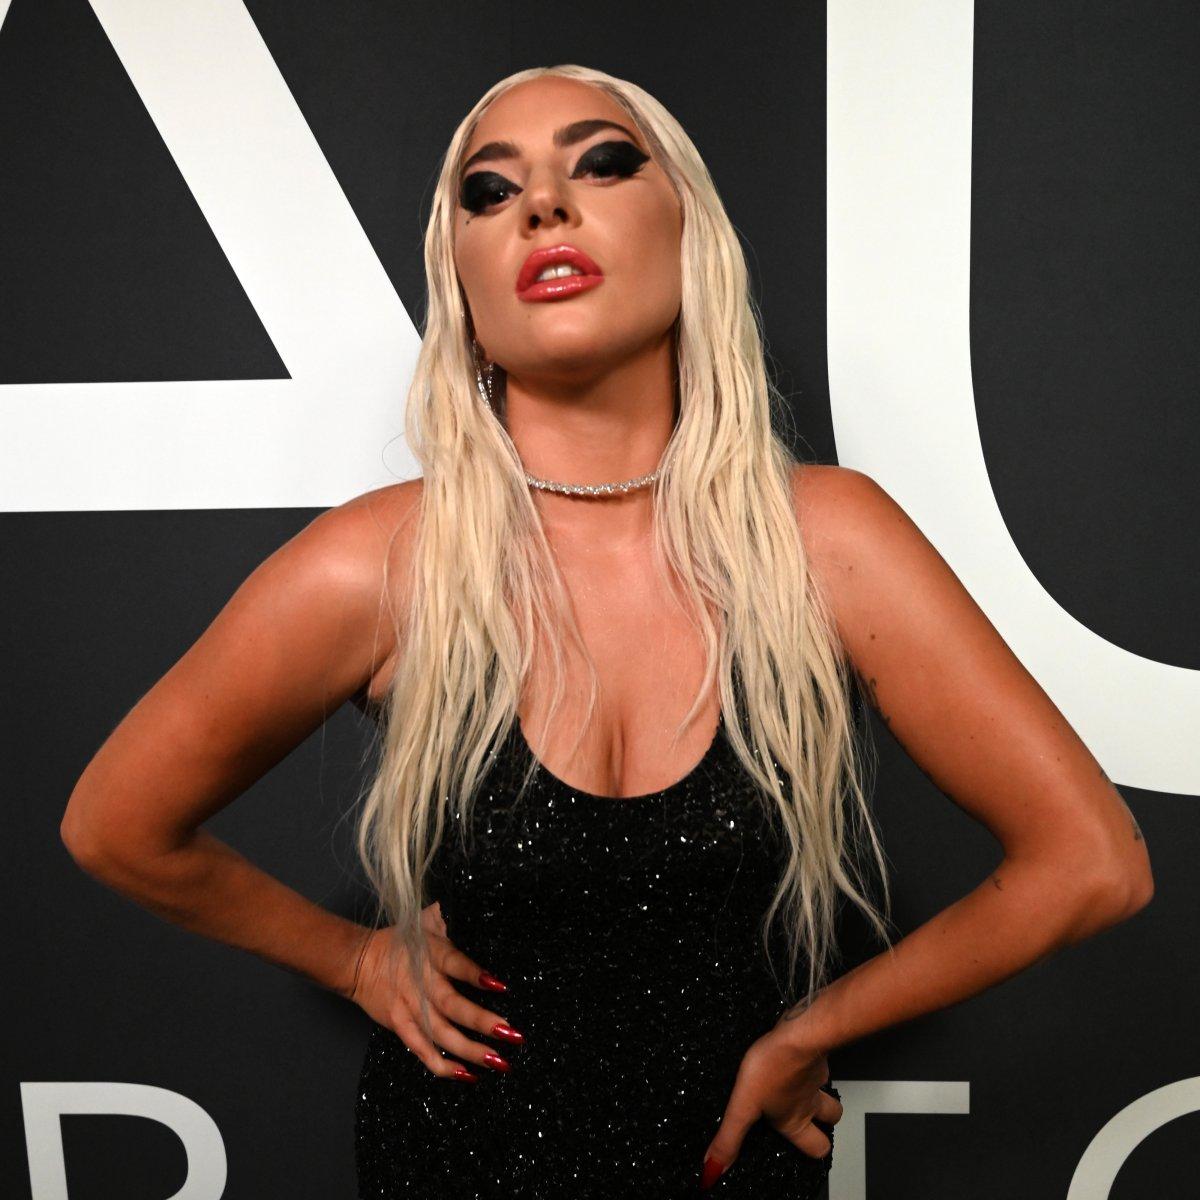 Lady Gaga attends Lady Gaga Celebrates the Launch of Haus Laboratories at Barker Hangar on Sept. 16, 2019 in Santa Monica, Calif.